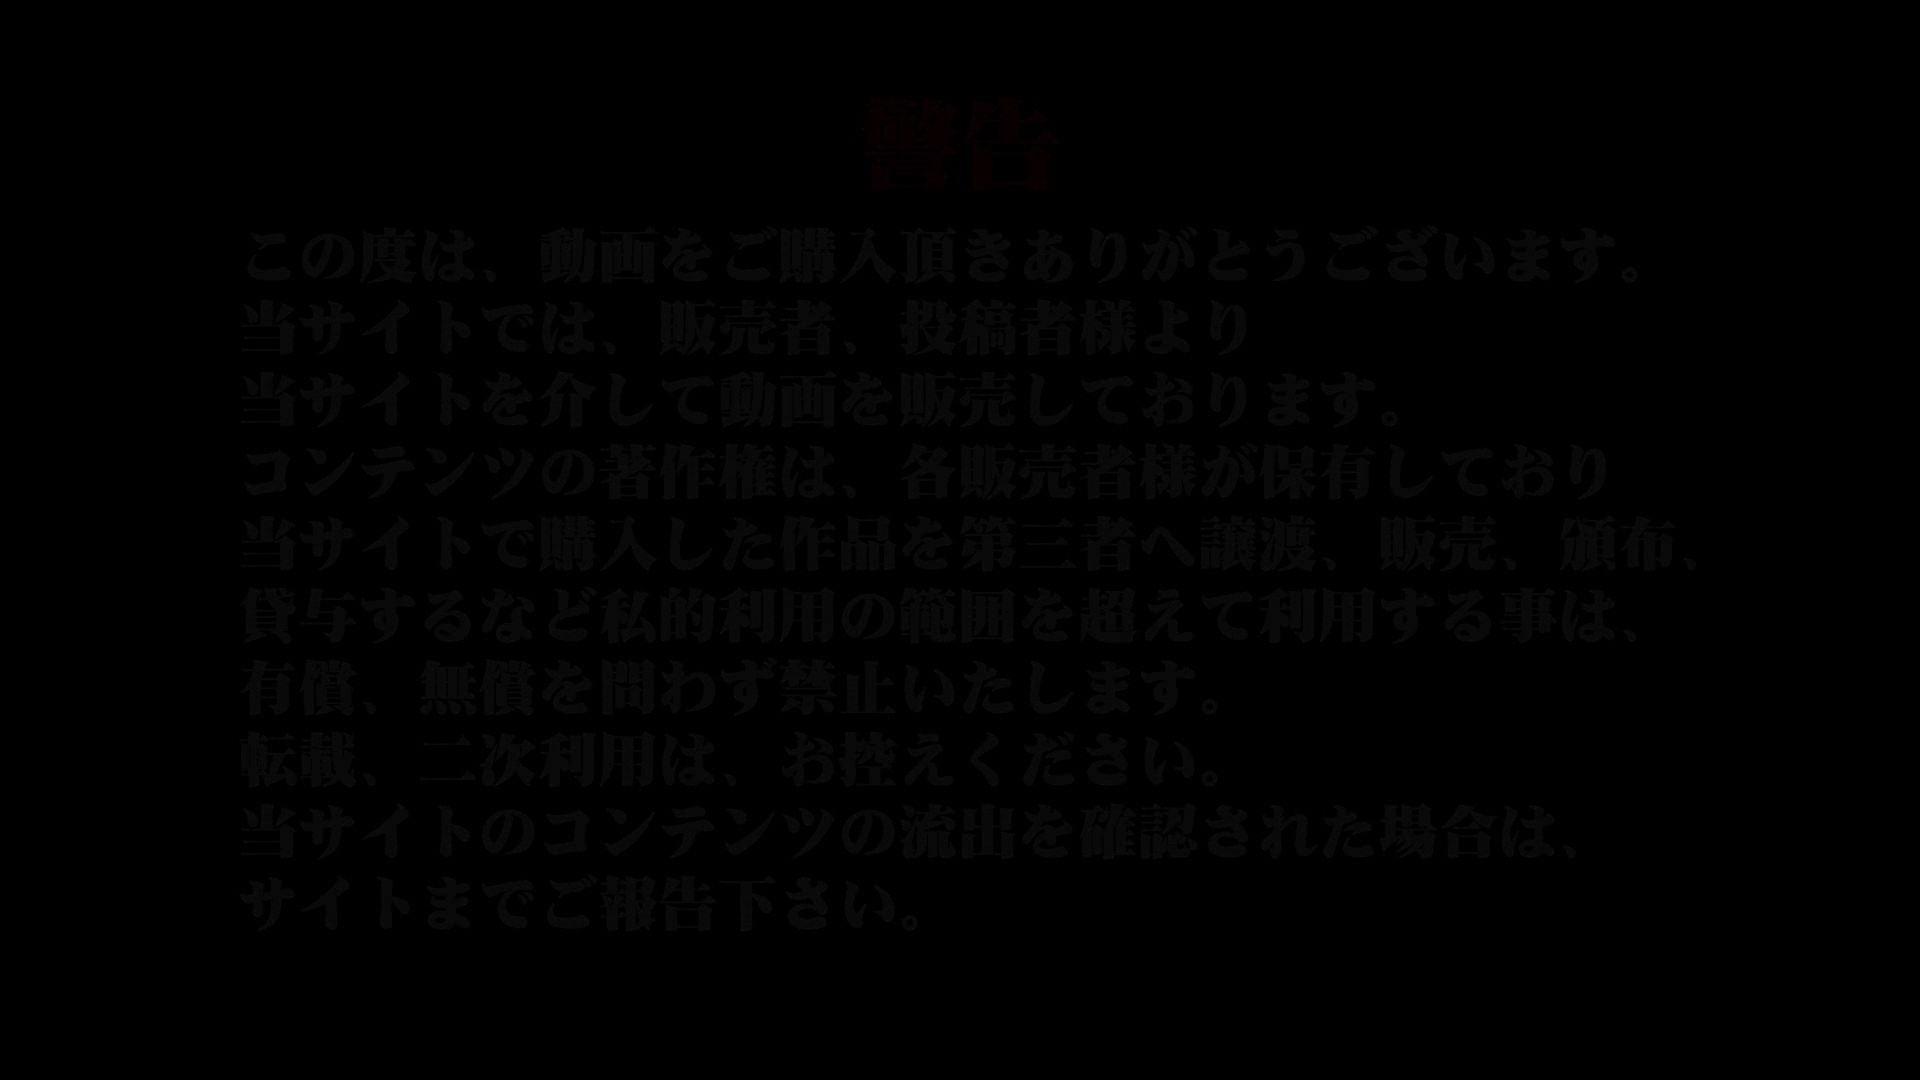 Aquaな露天風呂Vol.924 OLのエロ生活 オメコ動画キャプチャ 62連発 20